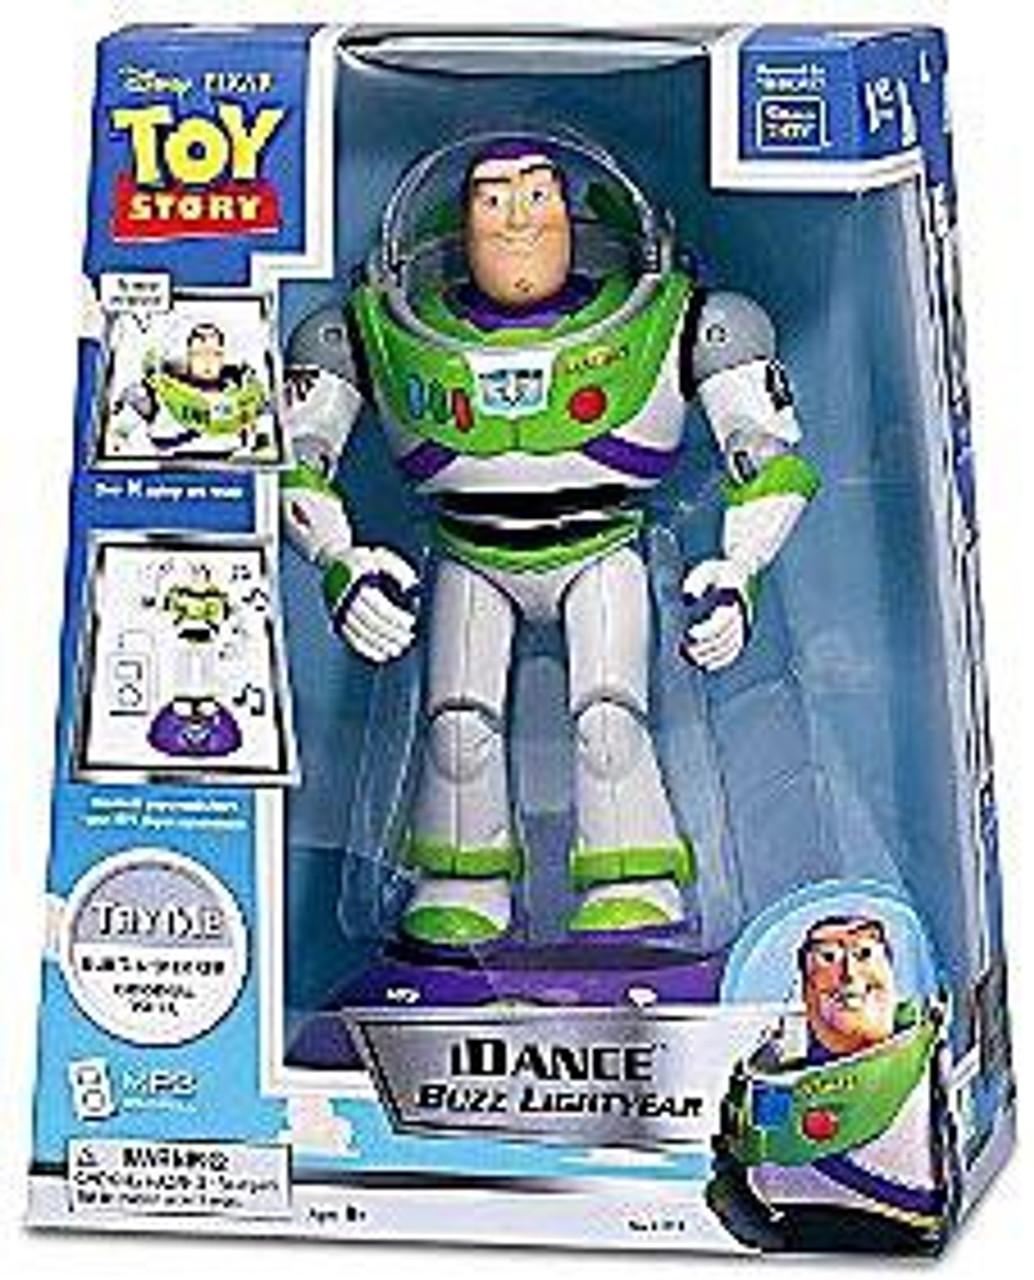 Toy Story iDance Buzz Lightyear Electronic Toy